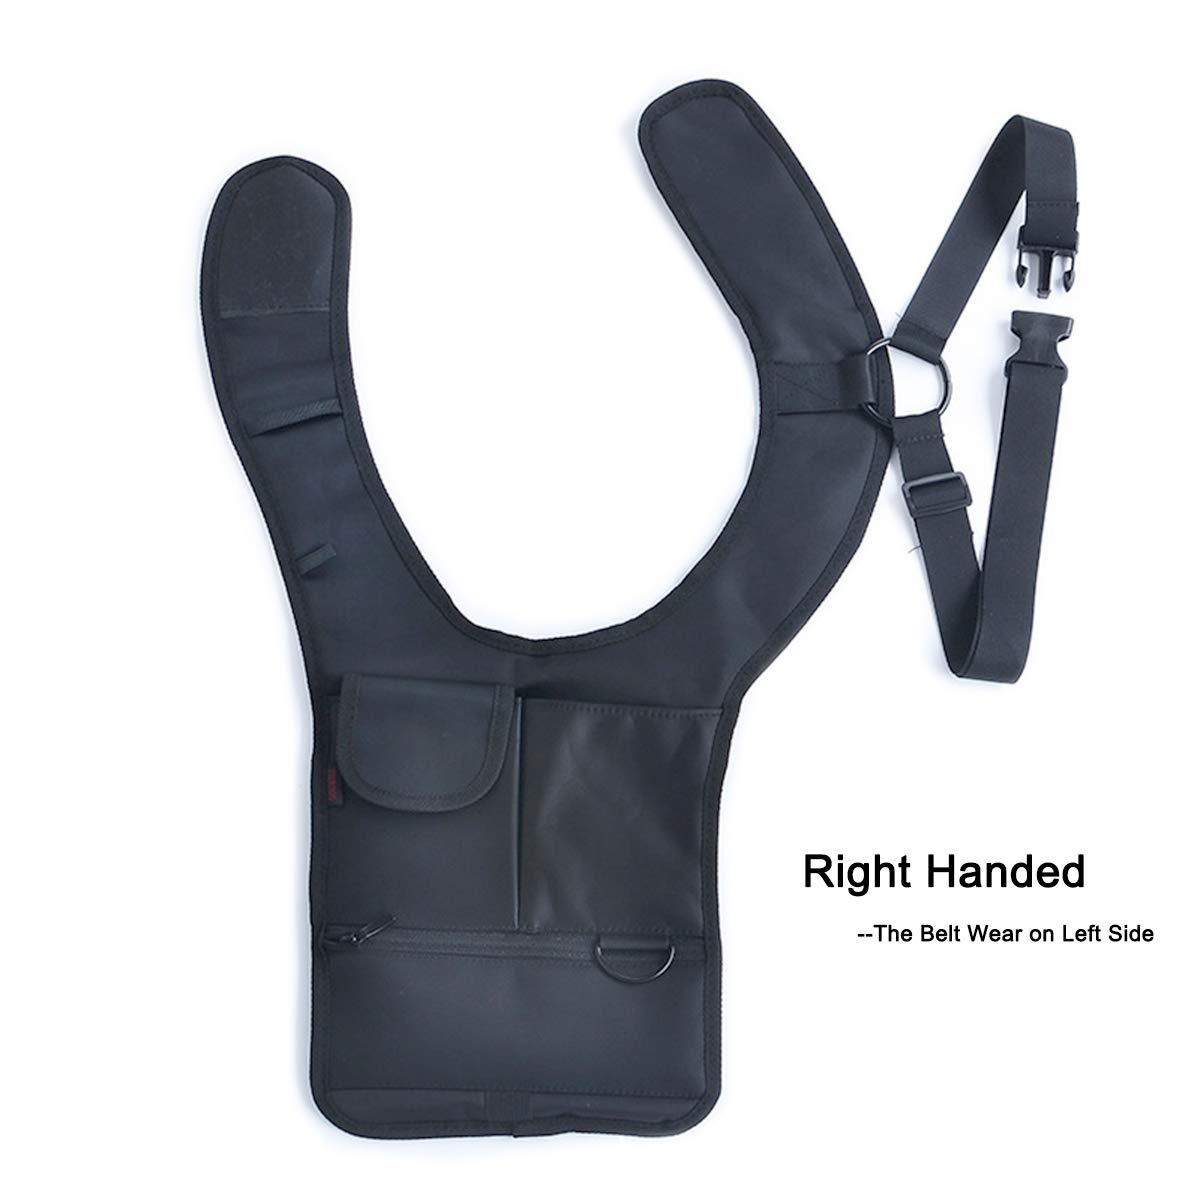 ZAIXU 右手尼龙*多功能隐形腋下单肩包隐藏包(皮带在左侧佩戴)